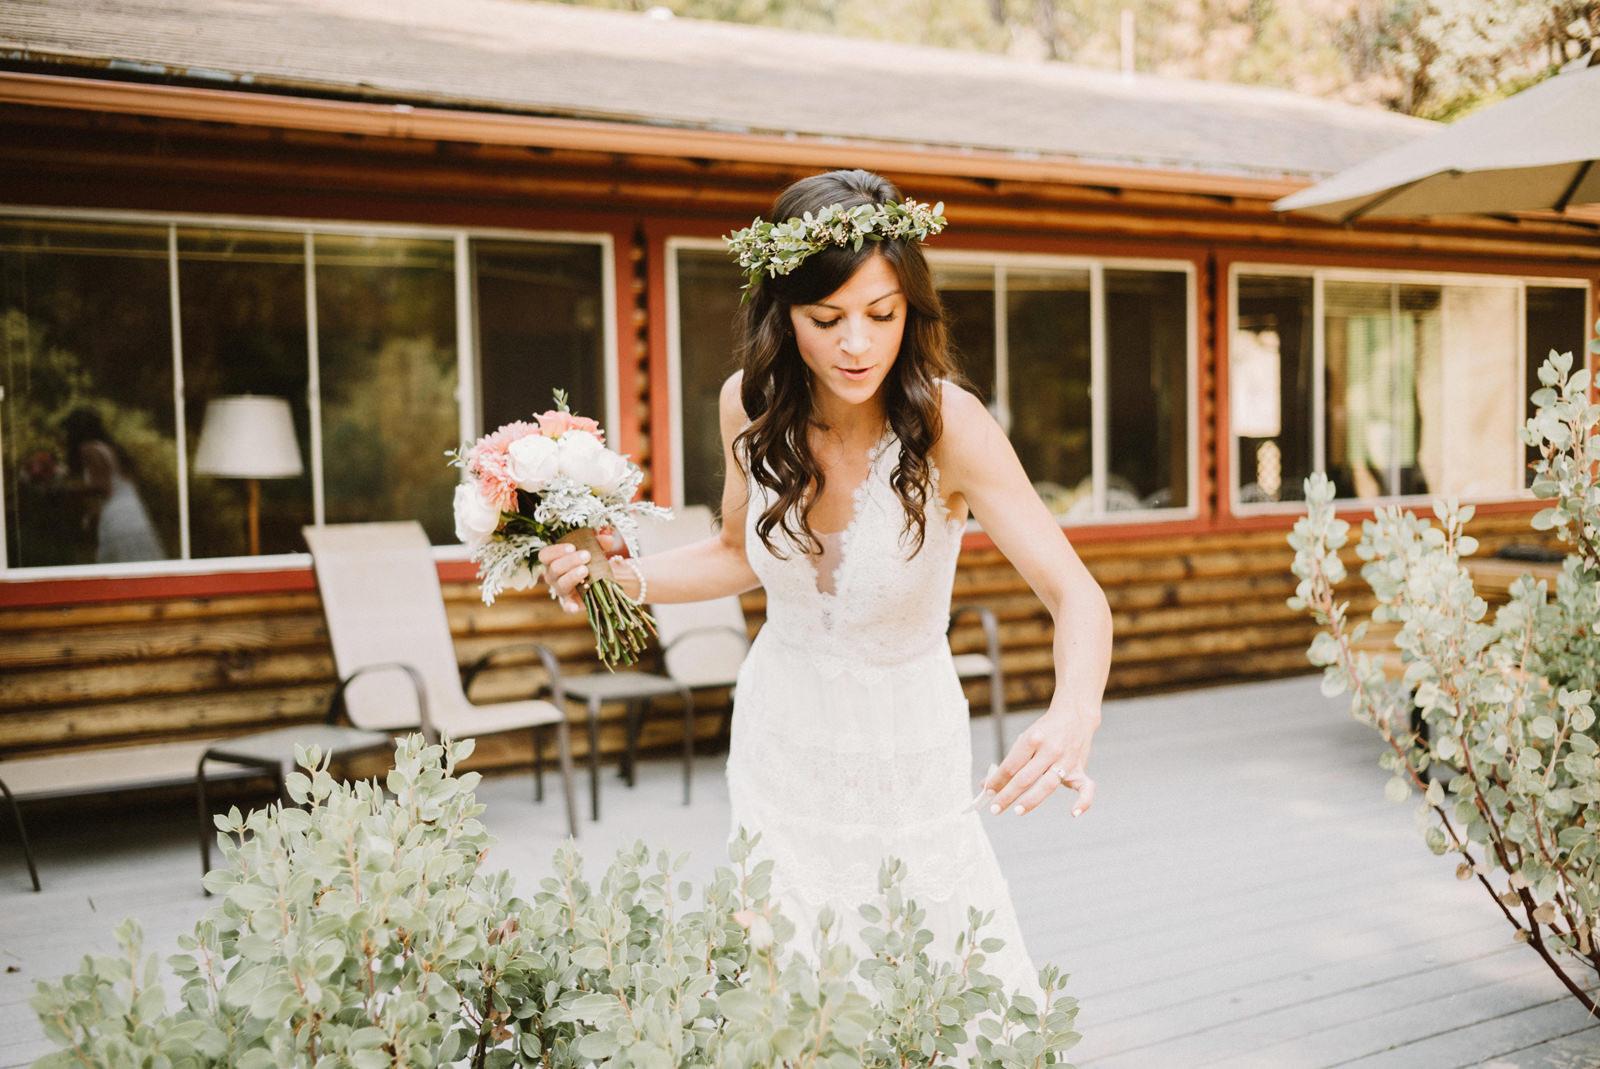 yosemite-intimate-wedding-012 YOSEMITE INTIMATE WEDDING